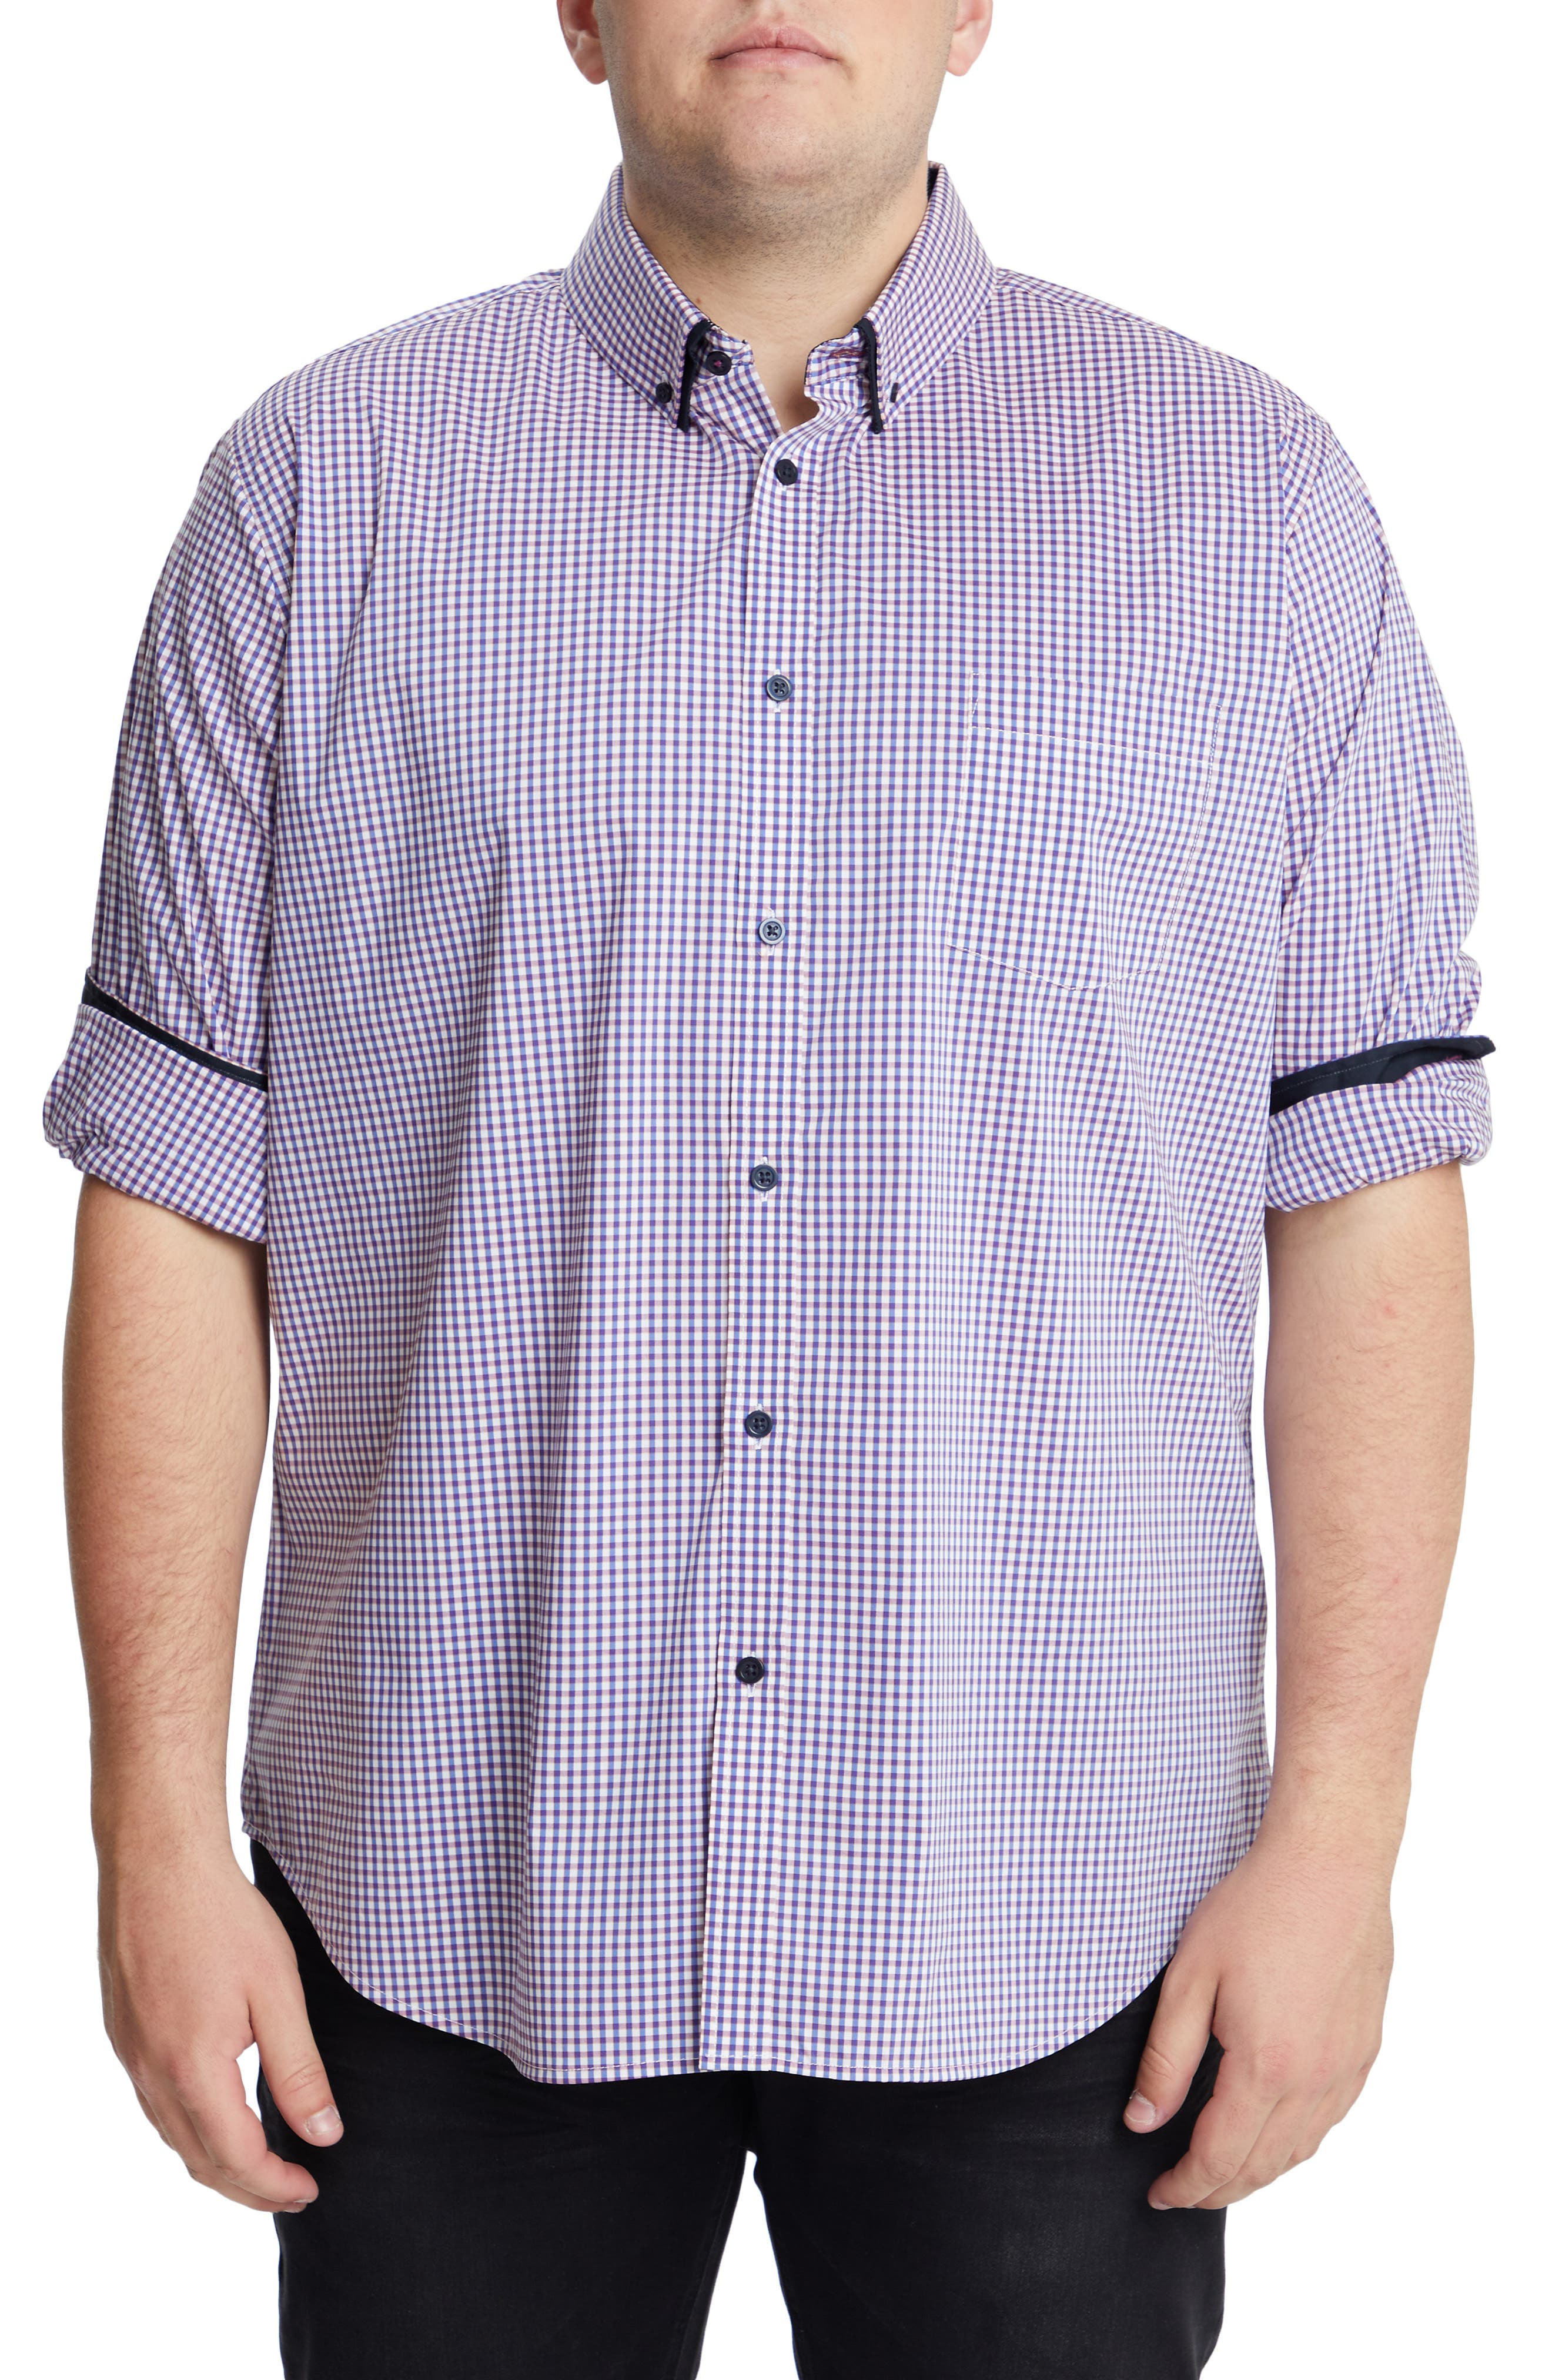 Smith Stretch Check Button-Down Shirt